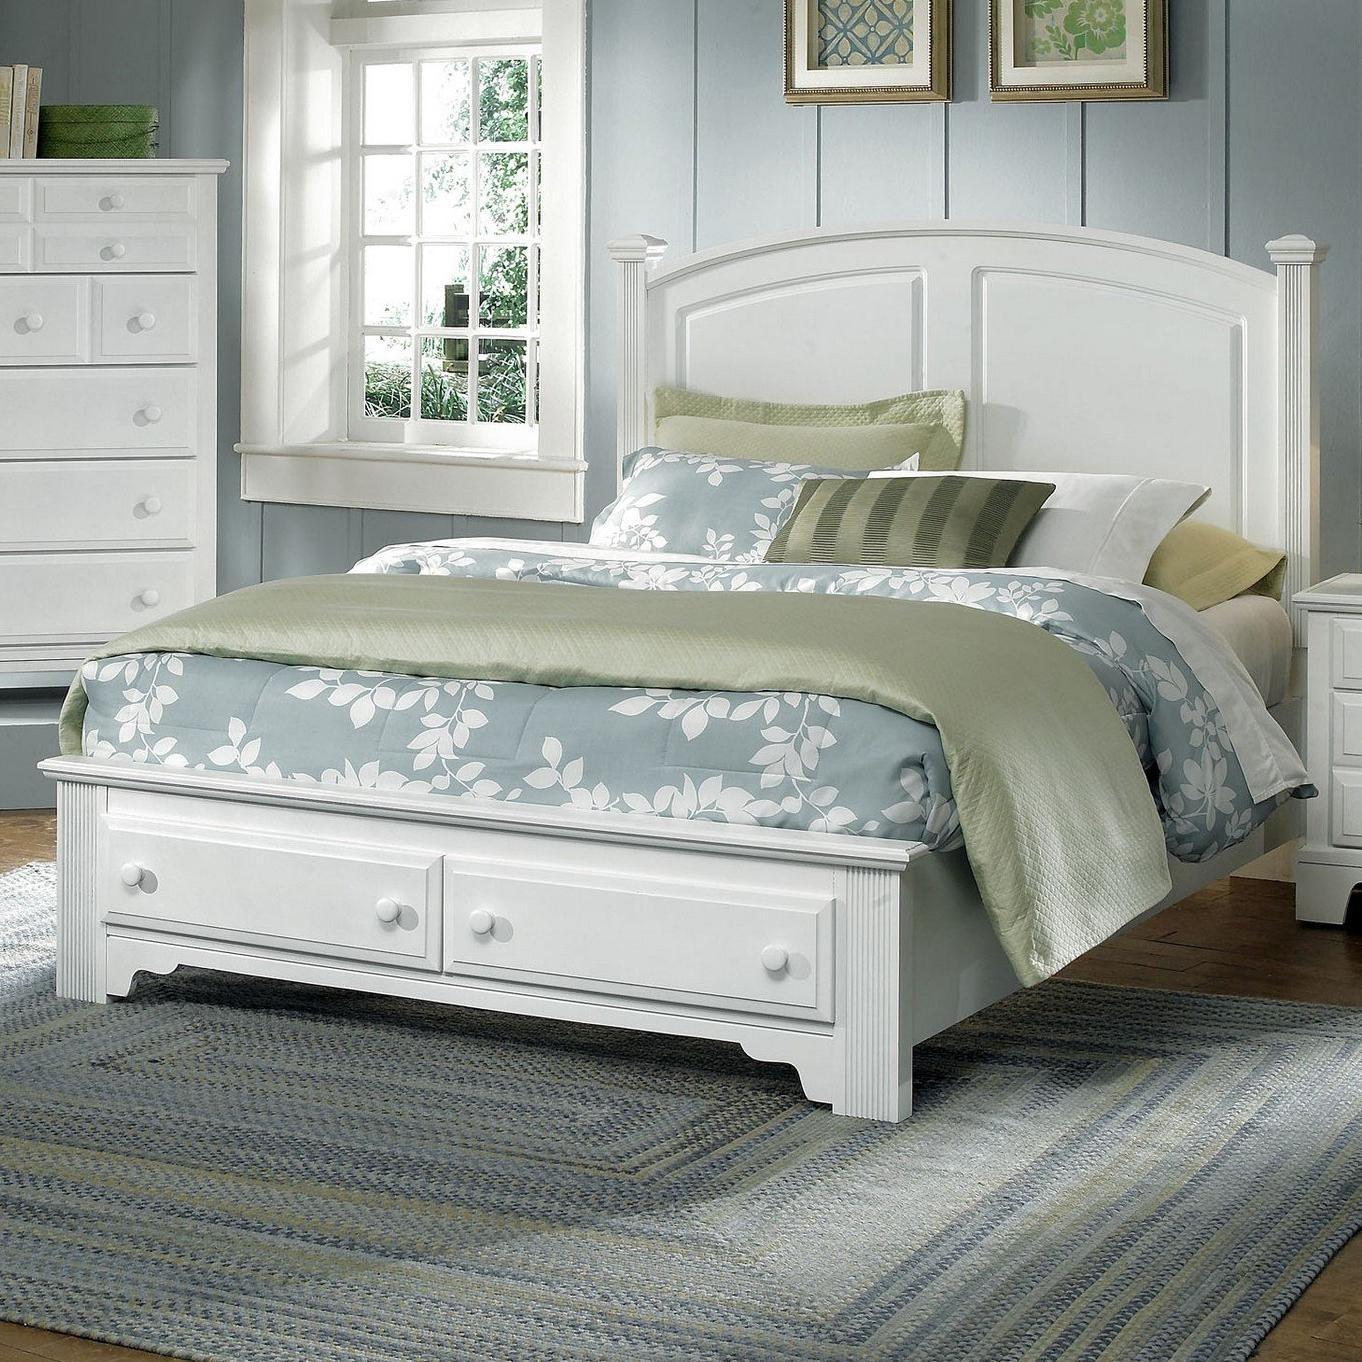 Hamilton/Franklin King Panel Storage Bed by Vaughan Bassett at Johnny Janosik